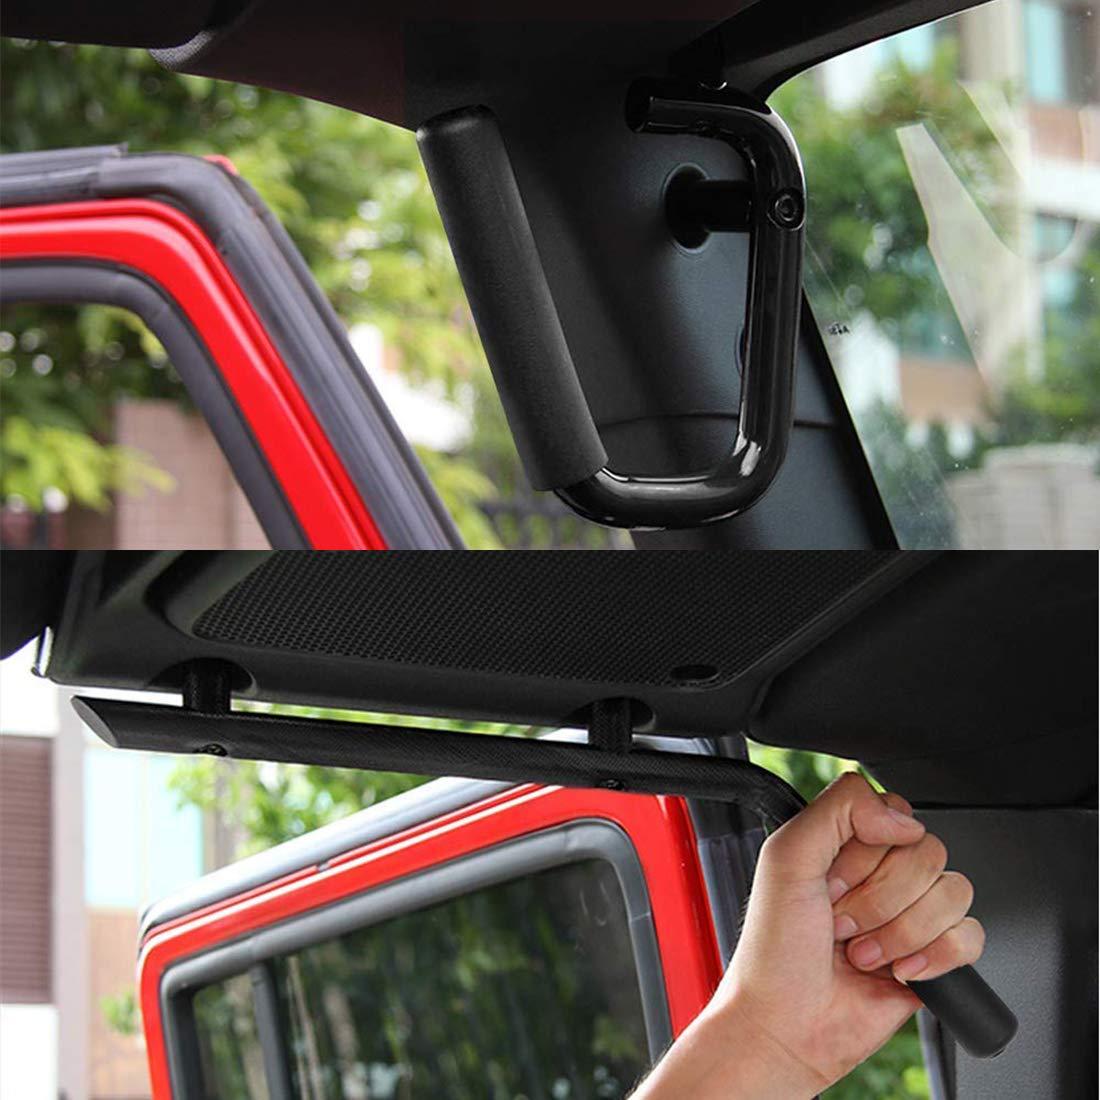 SUPAREE Black Front /& Rear Grab Bar Solid Steel Grab Handle Kit for 2007-2018 Jeep Wrangler JK JKU Sahara Sports Freedom Rubicon X /& Unlimited 2//4 Door